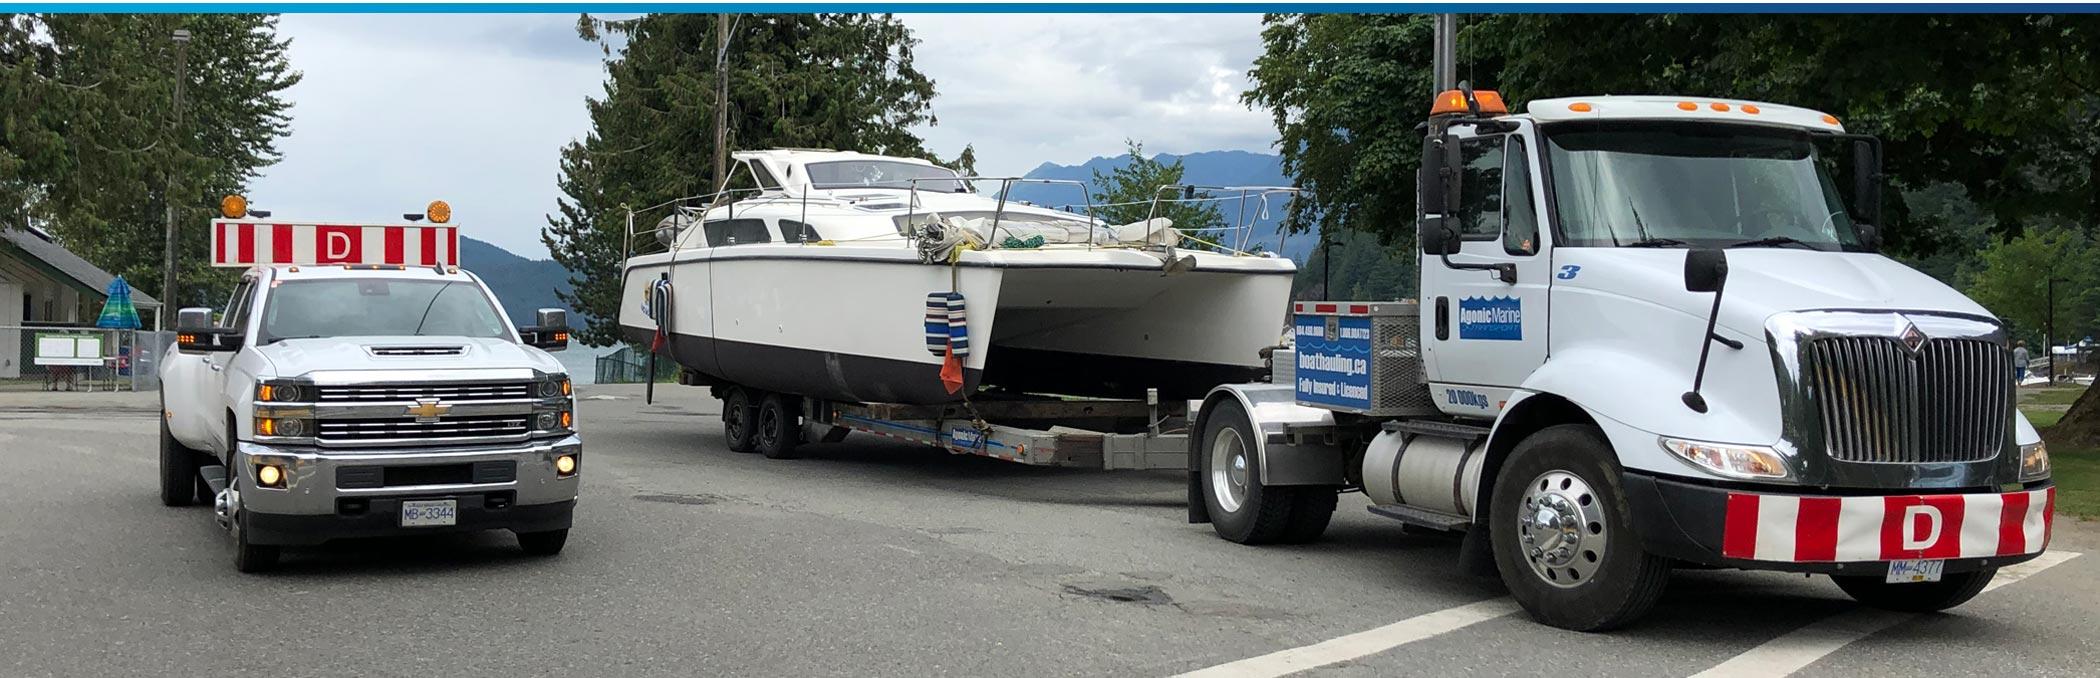 Agonic Marine BC Boat Hauling Service